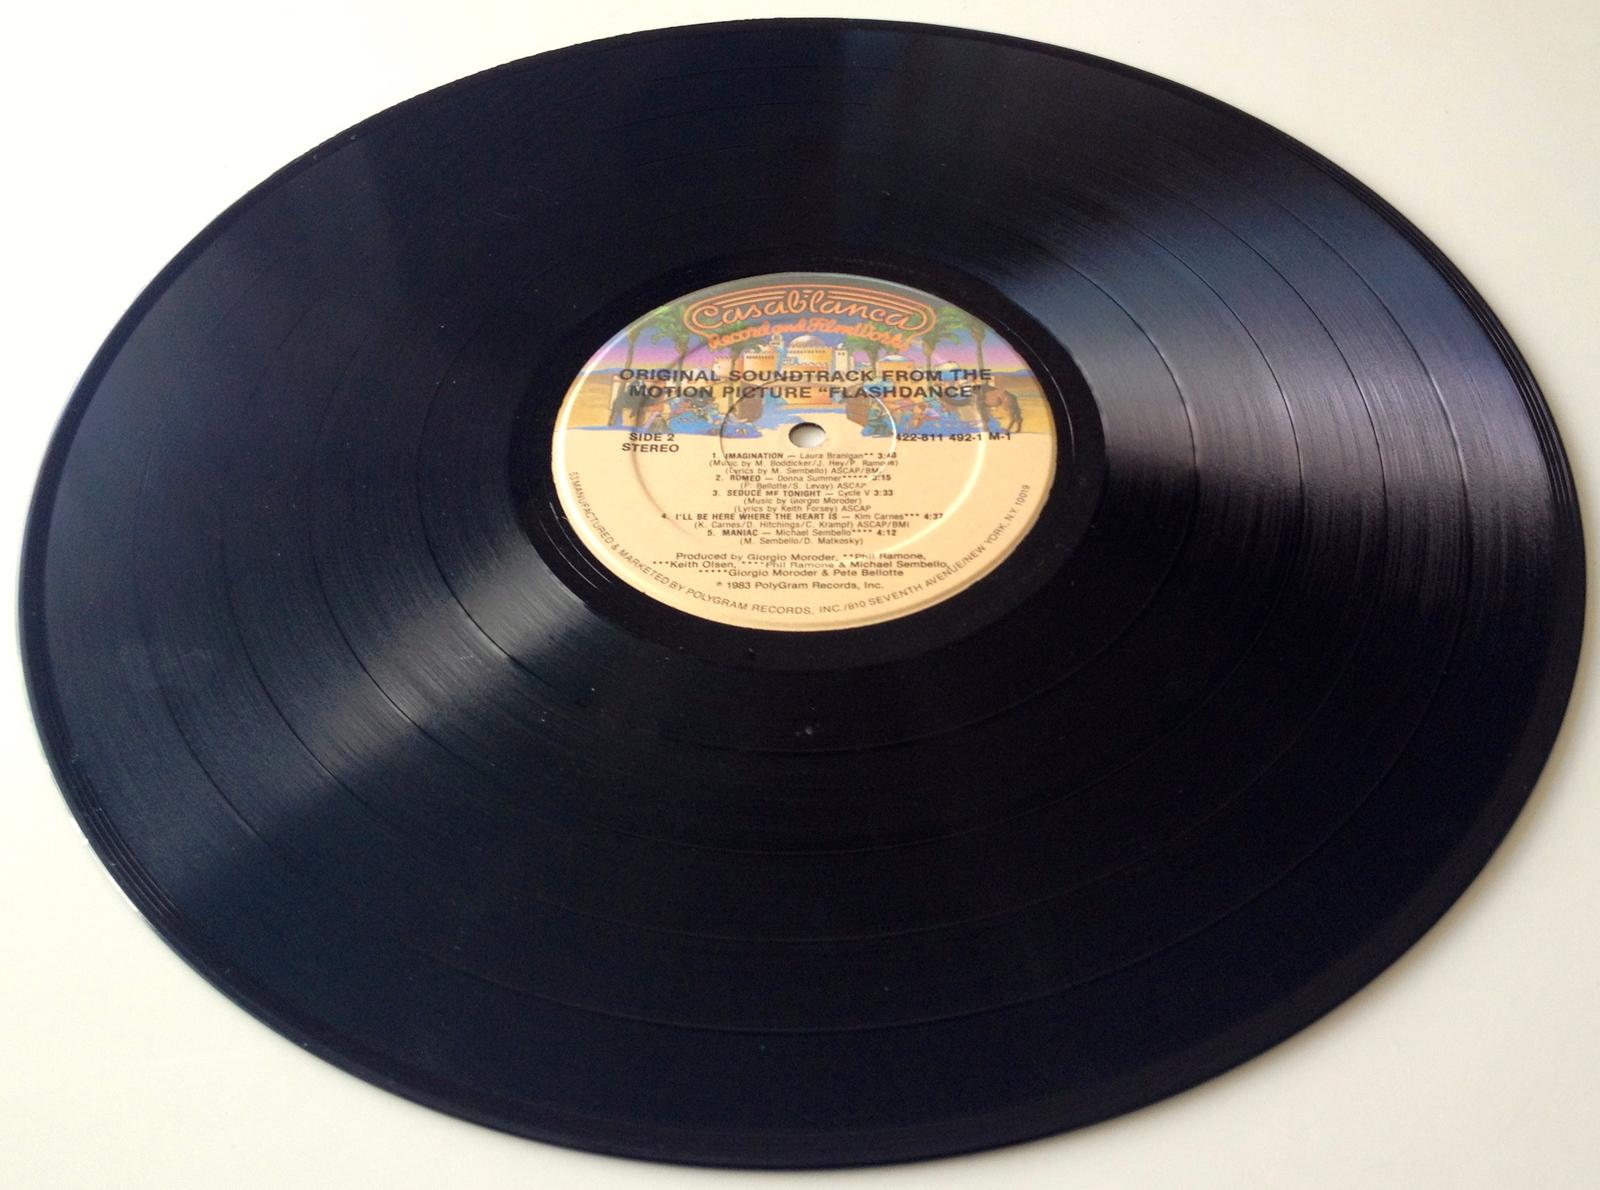 Flashdance Original Soundtrack LP Vinyl Record Album, 1983, Original Pressing